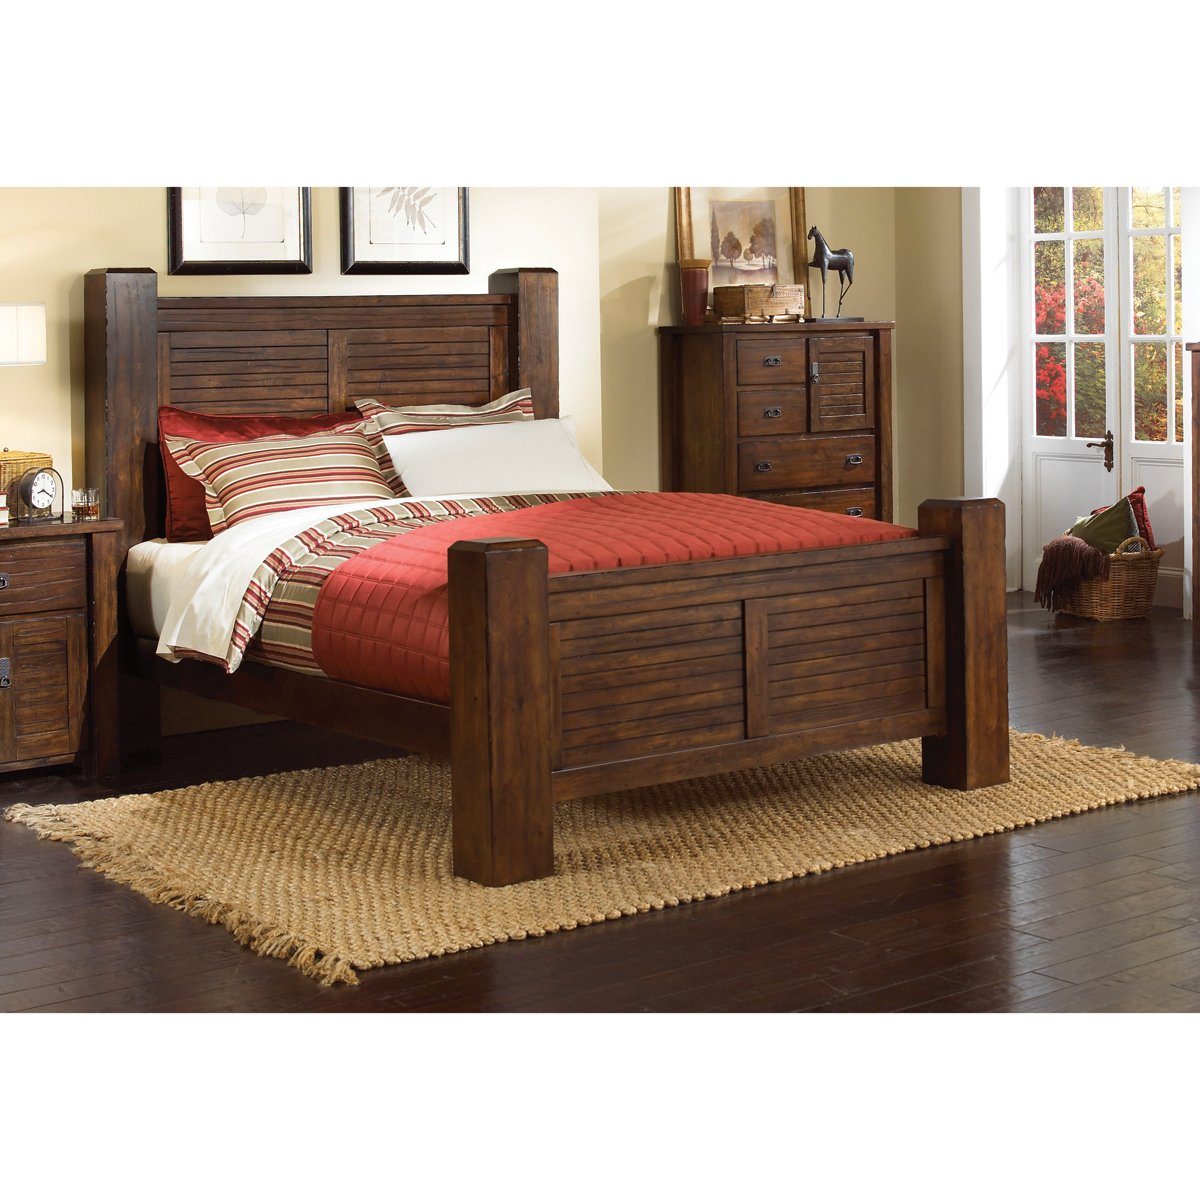 California King Bedroom Set: Dark Pine 6-Piece California King Bed Bedroom Set